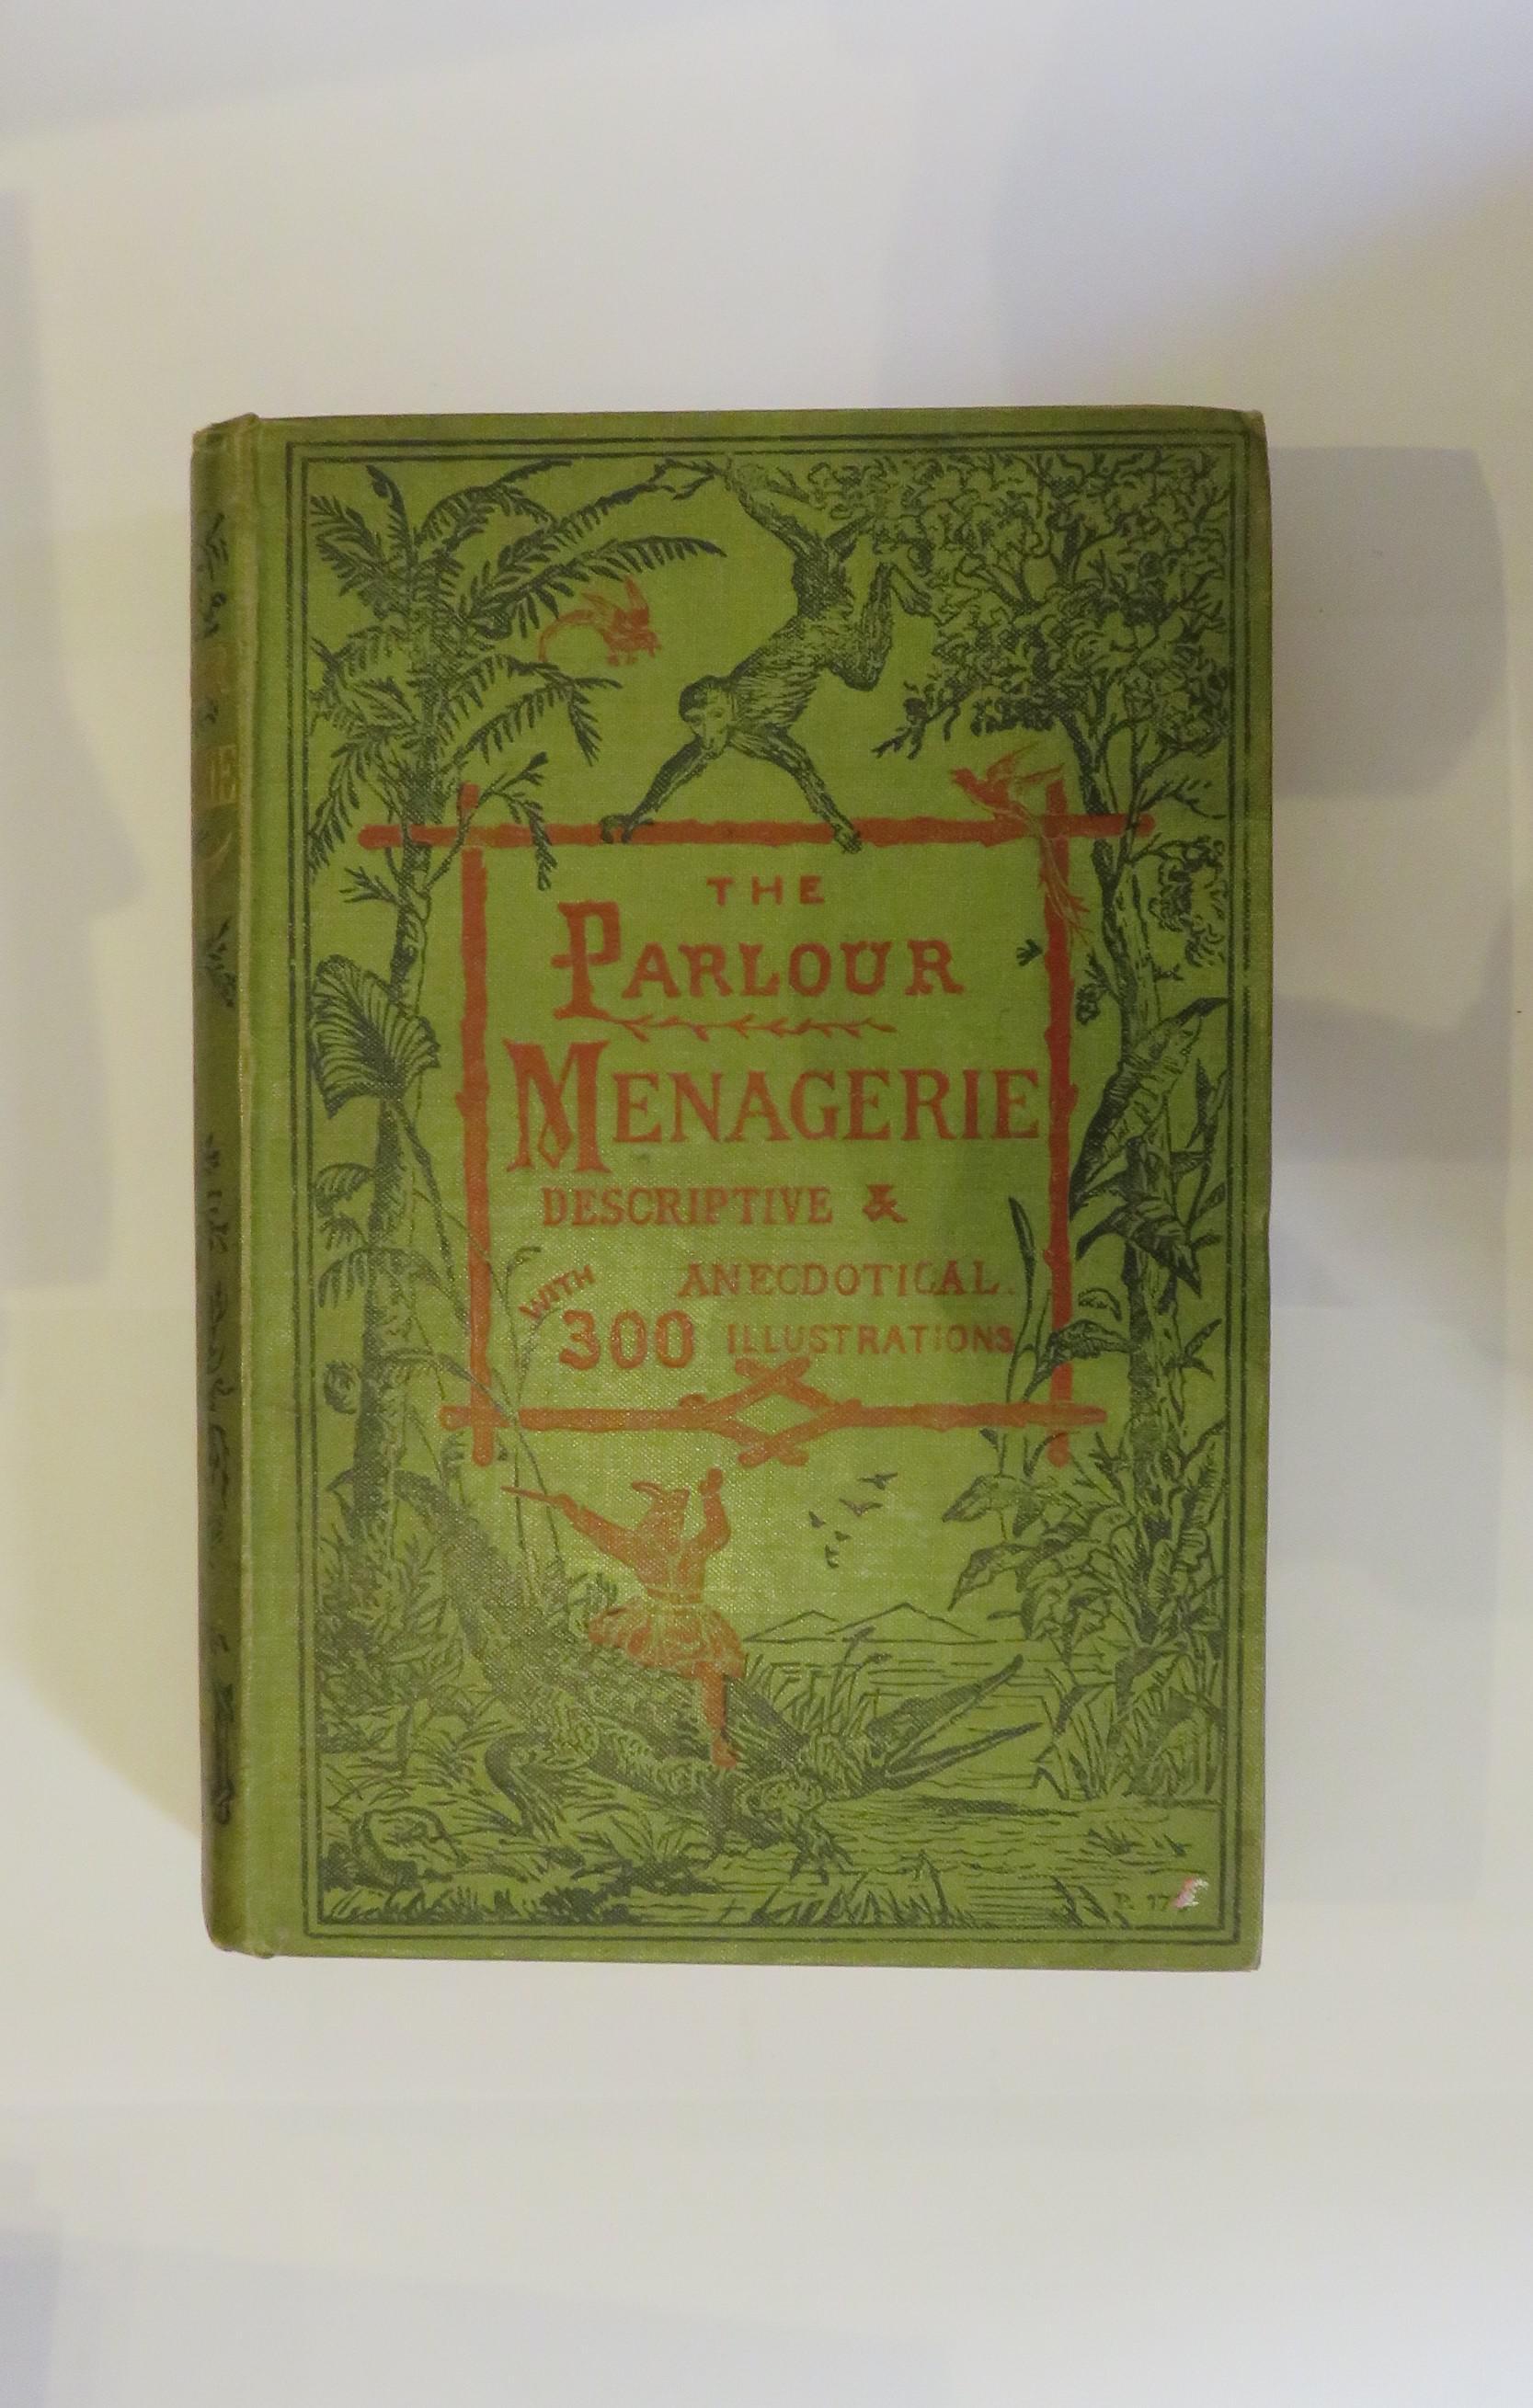 The Parlour Menagerie